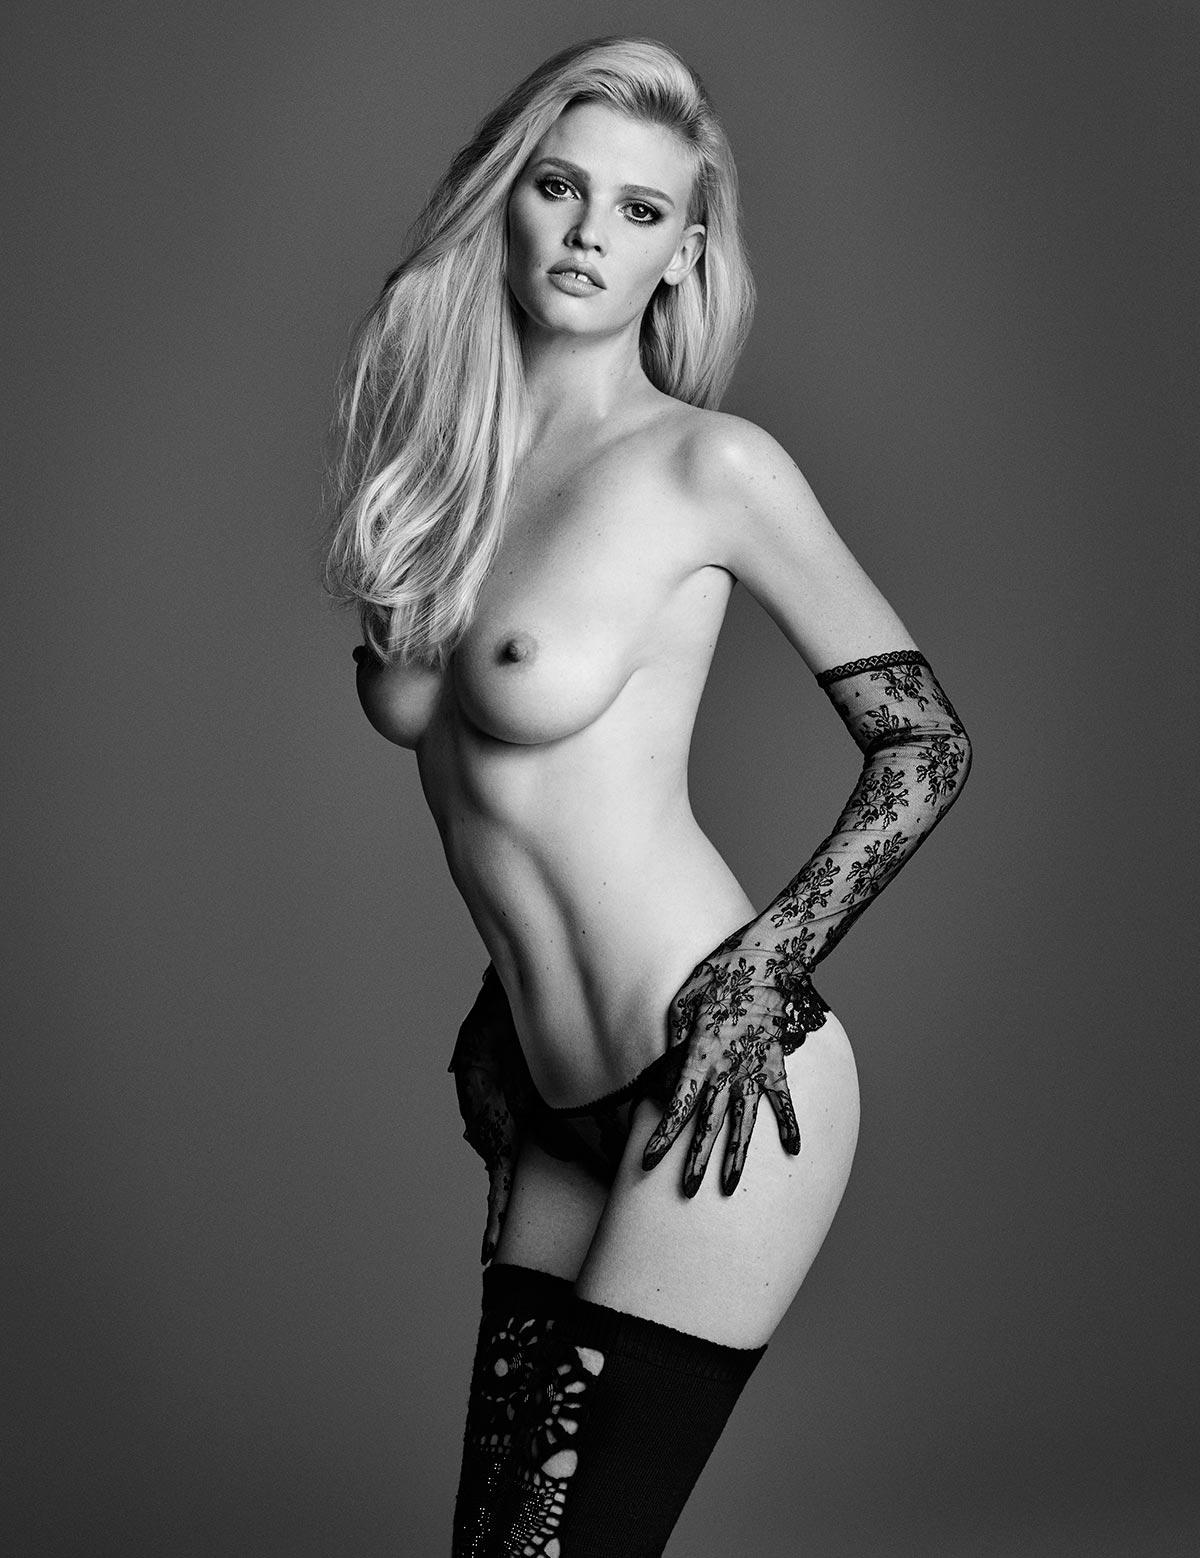 Lara Stone topless photos (7)